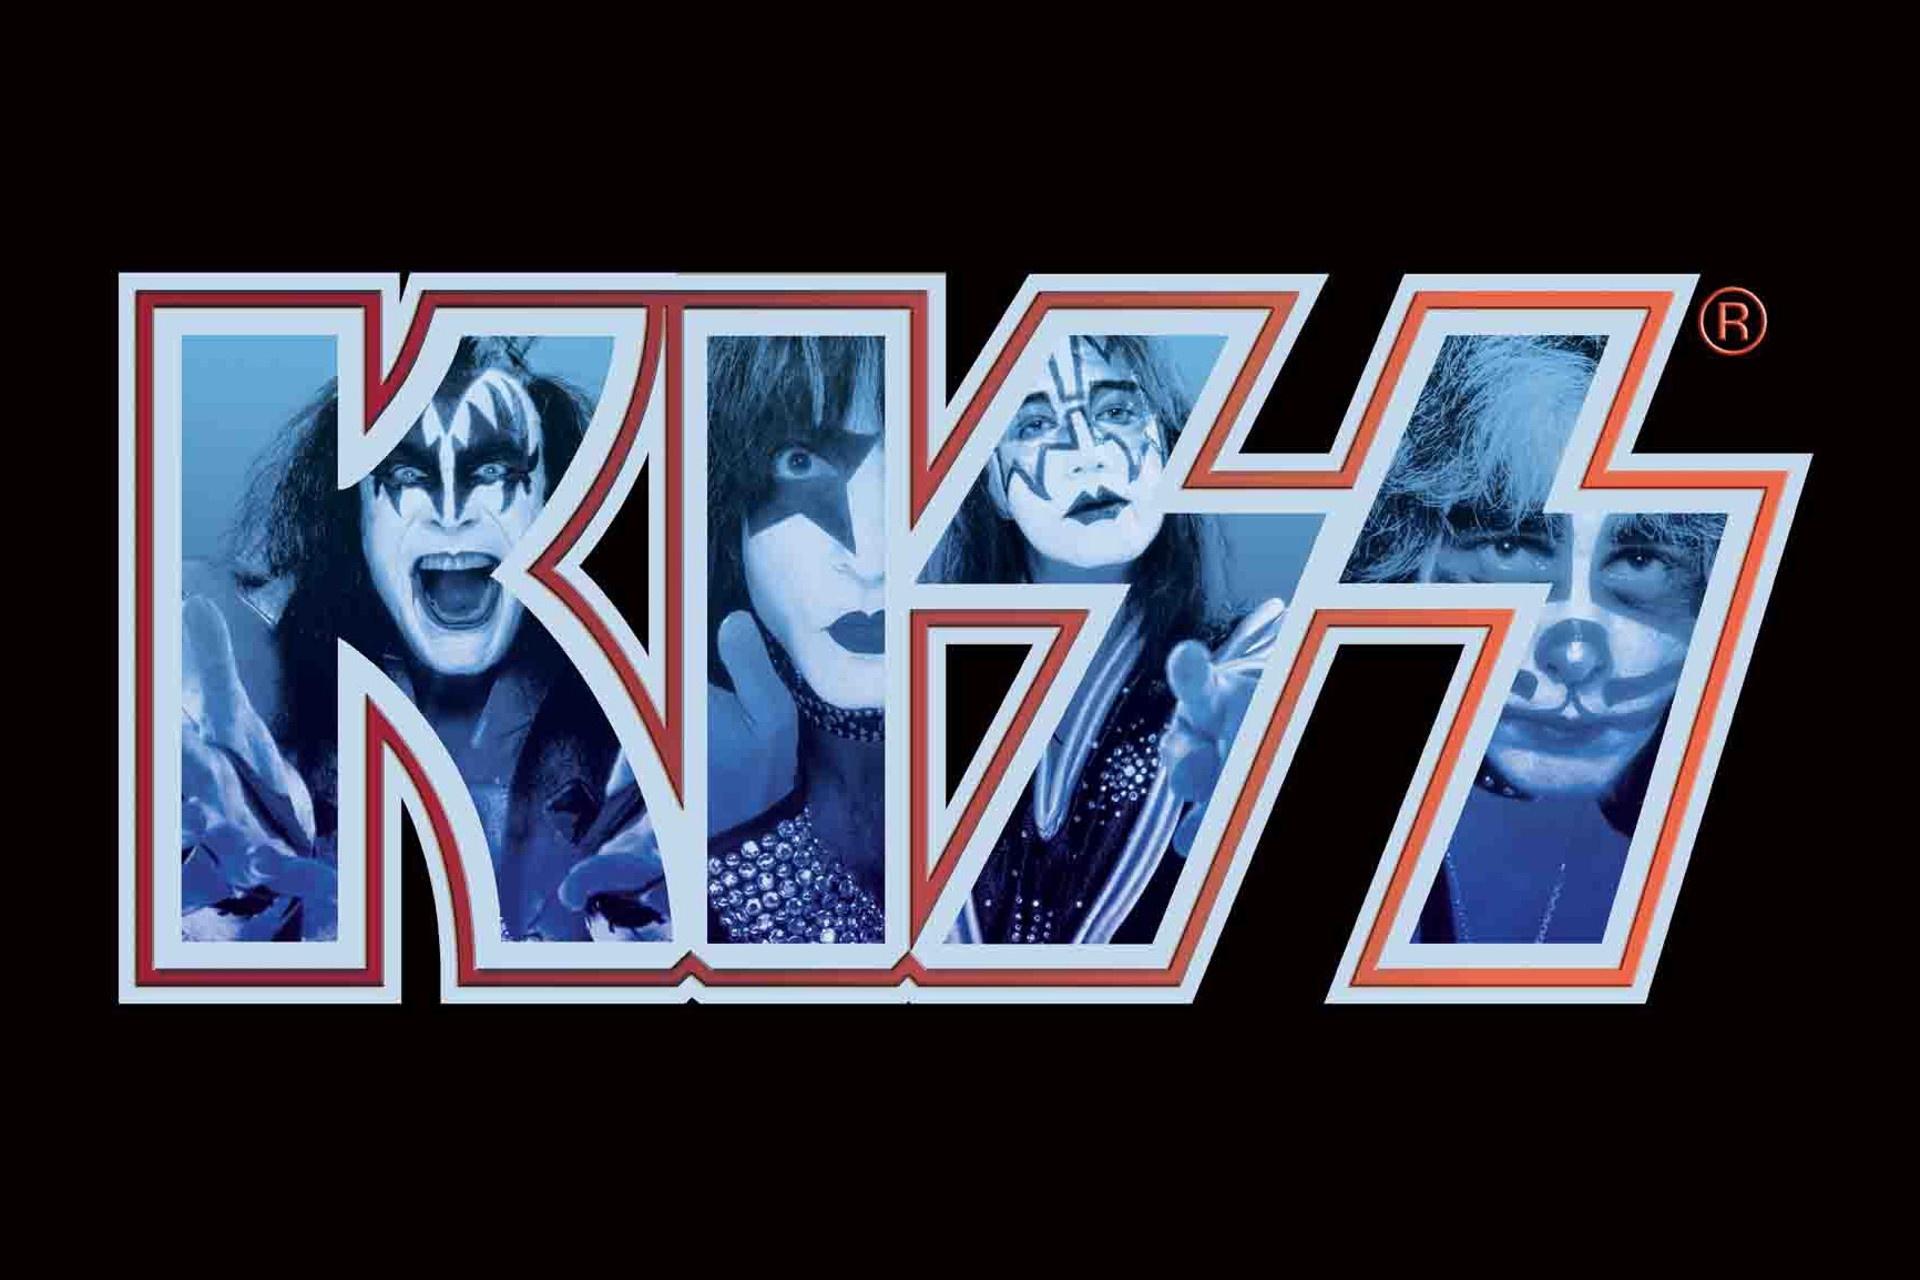 Wallpaper kiss logo classic rock desktop wallpaper Music 1920x1280